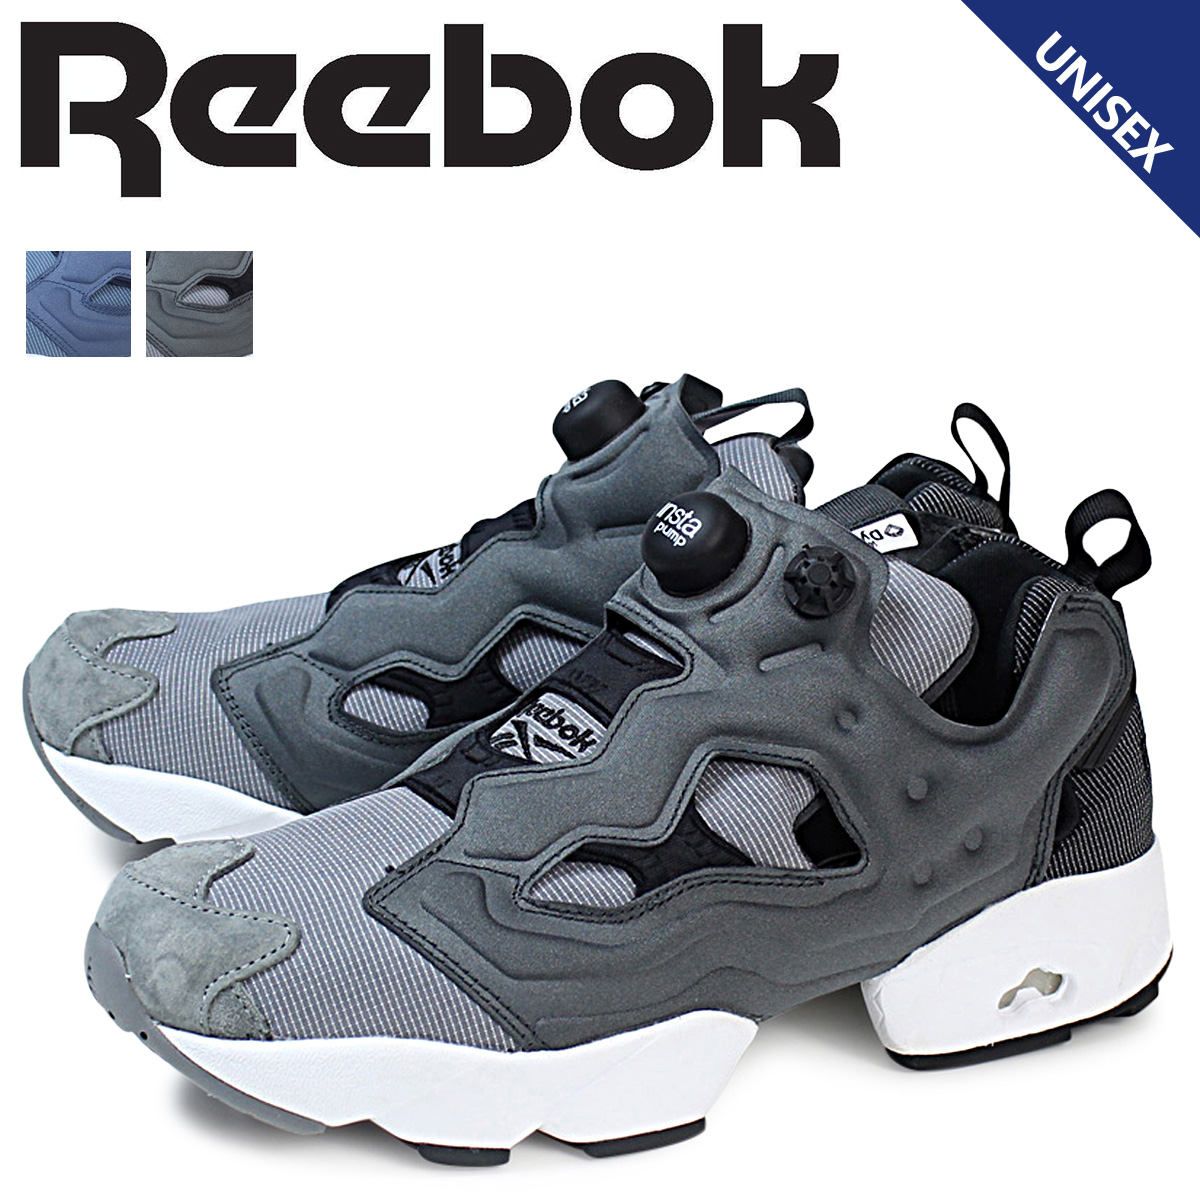 Reebok ポンプフューリー スニーカー リーボック INSTAPUMP FURY TECH レディース メンズ AR0624 AR0625 靴 ブラック ネイビー 【決算セール 返品不可】